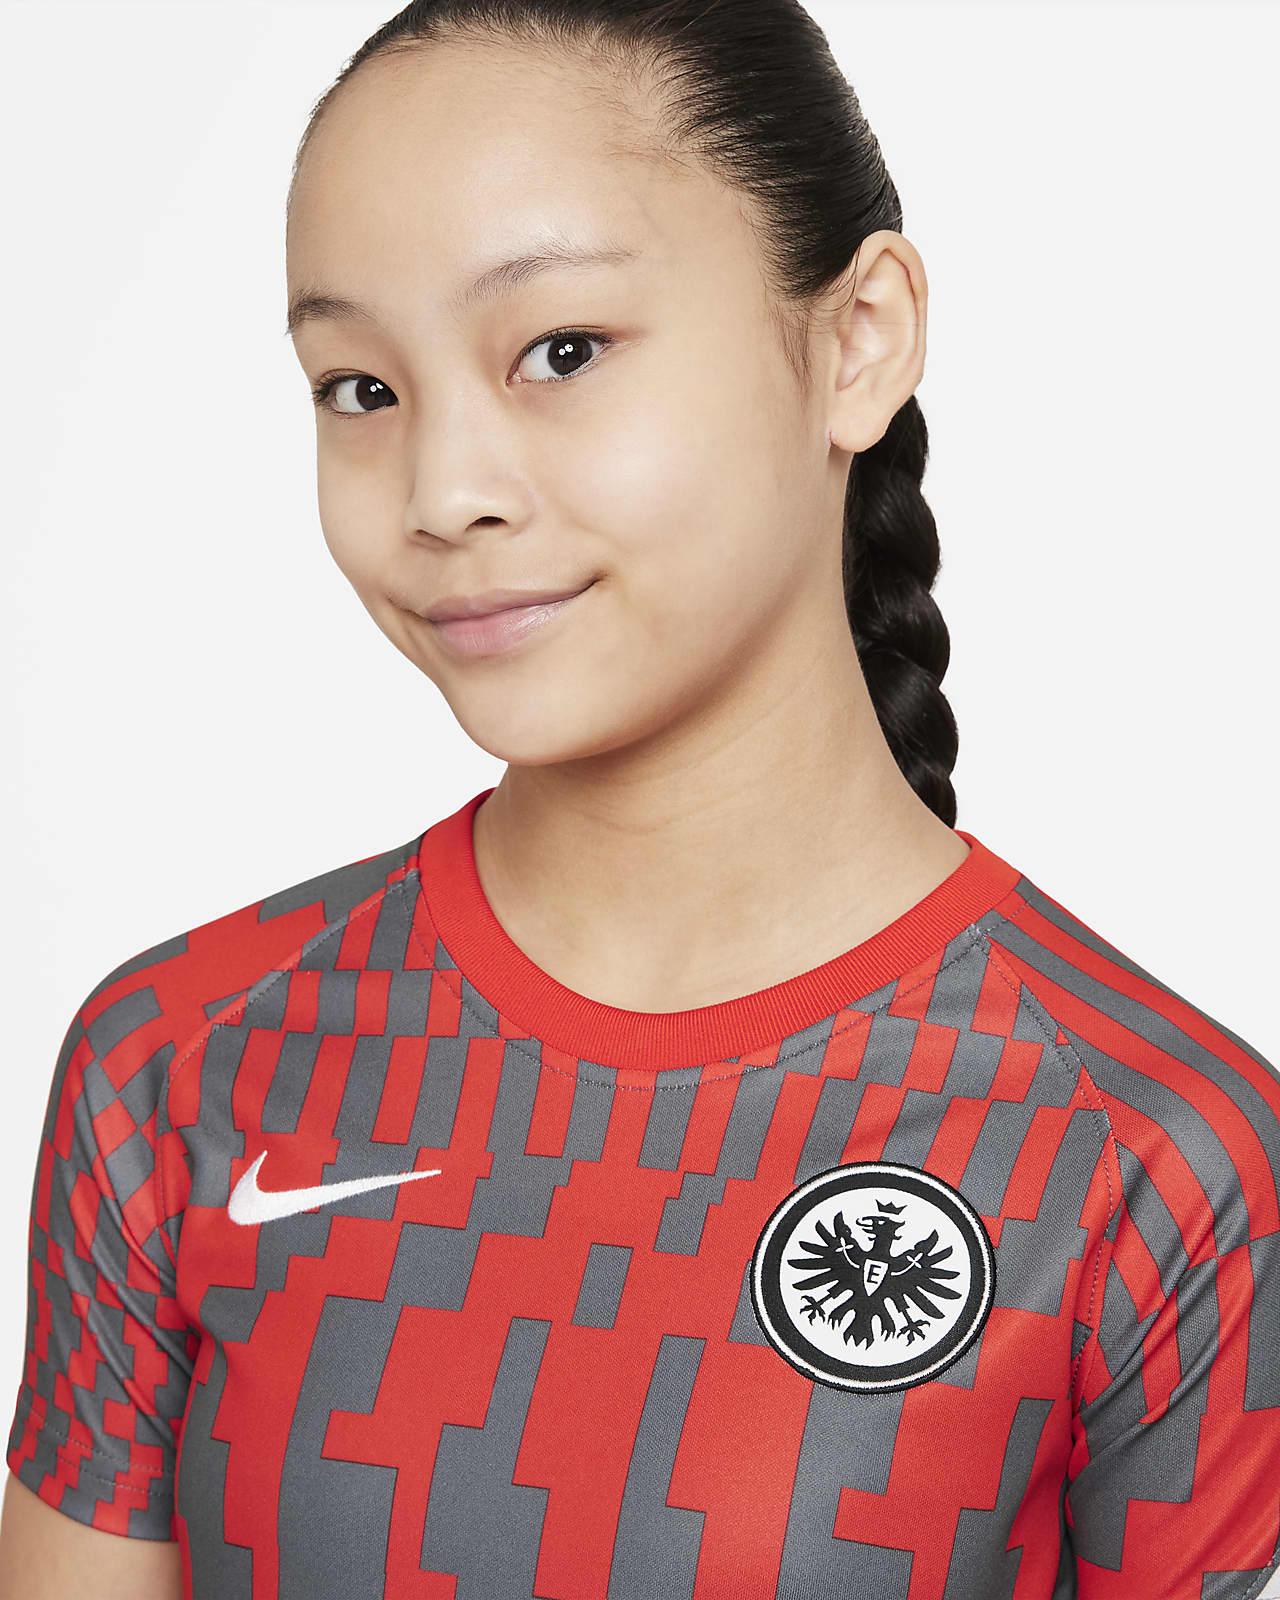 Girls frankfurt asia THE BEST